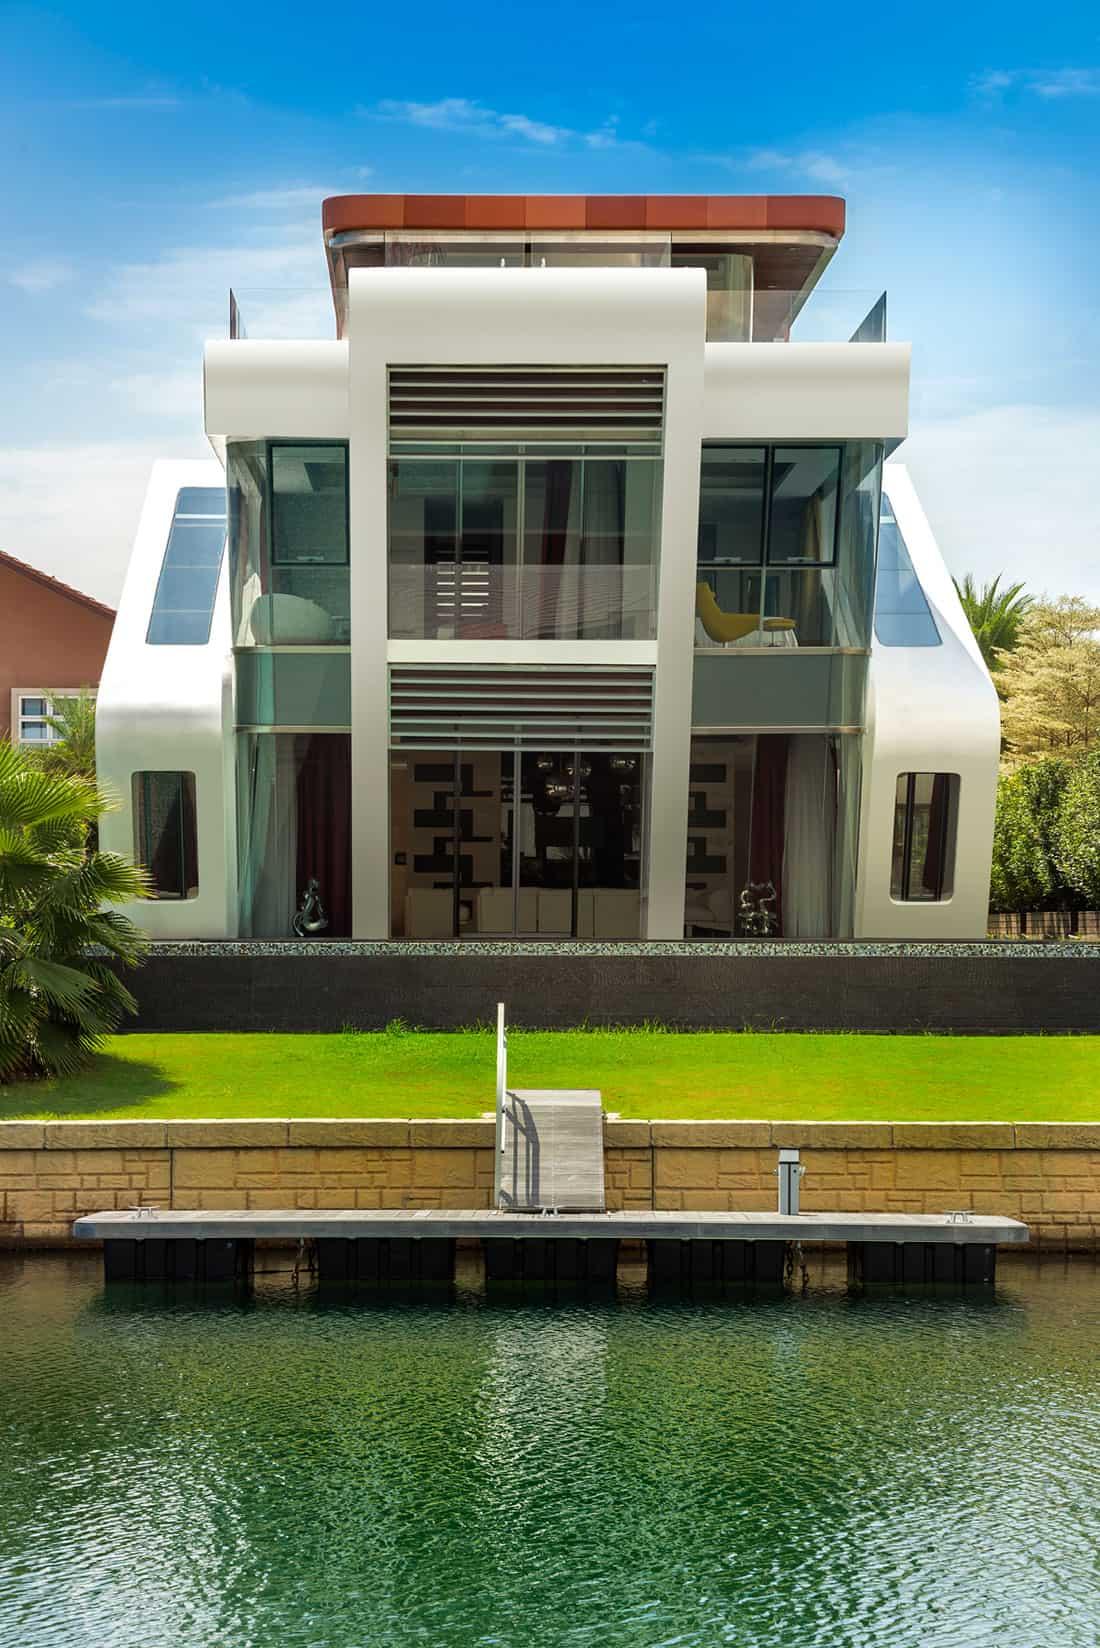 Mercurio Design Lab Create a Modern Villa